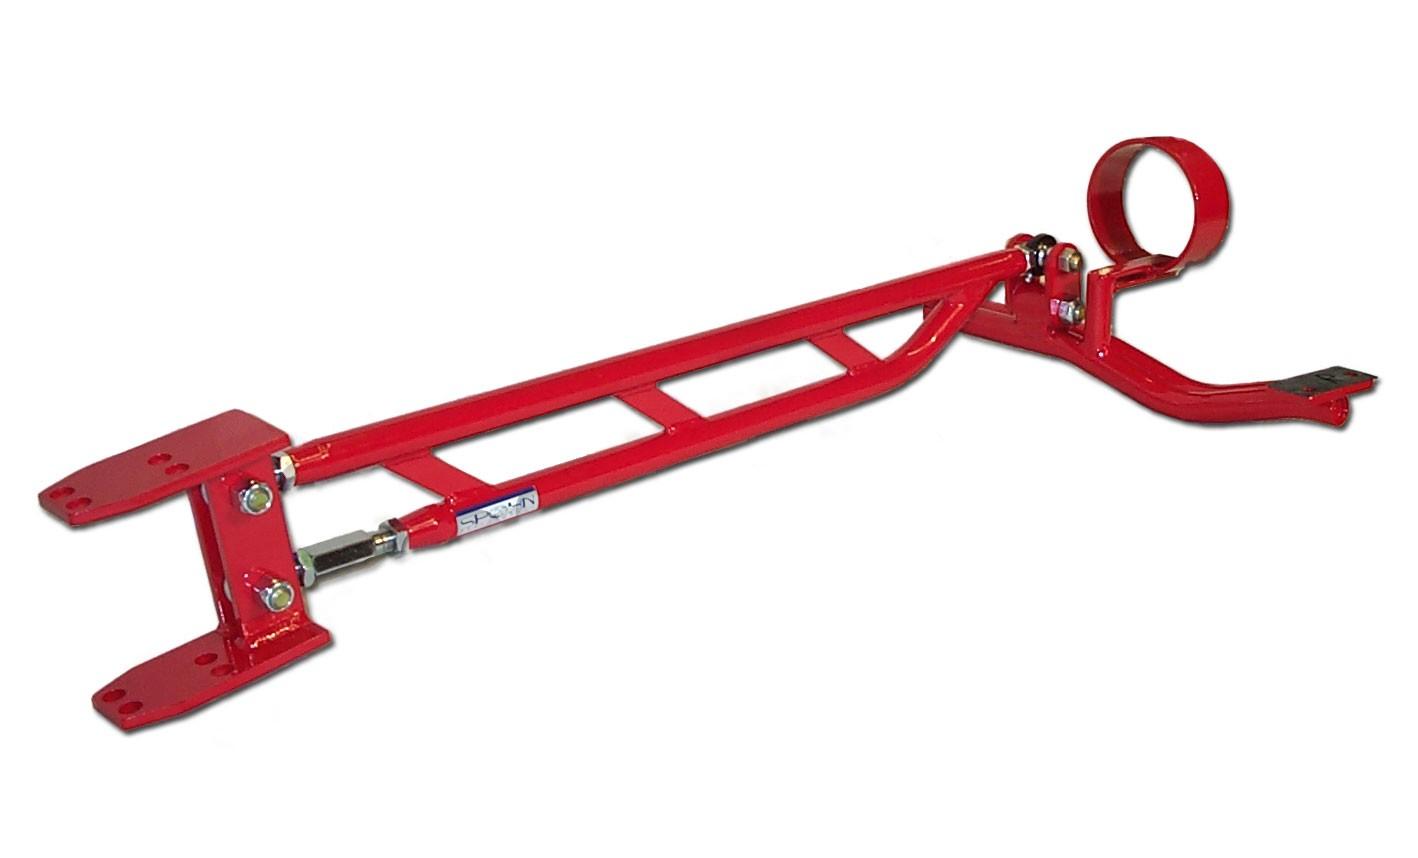 Spohn 98-02 Camaro/Firebird Adj. Torque Arm w/ Long Tubes